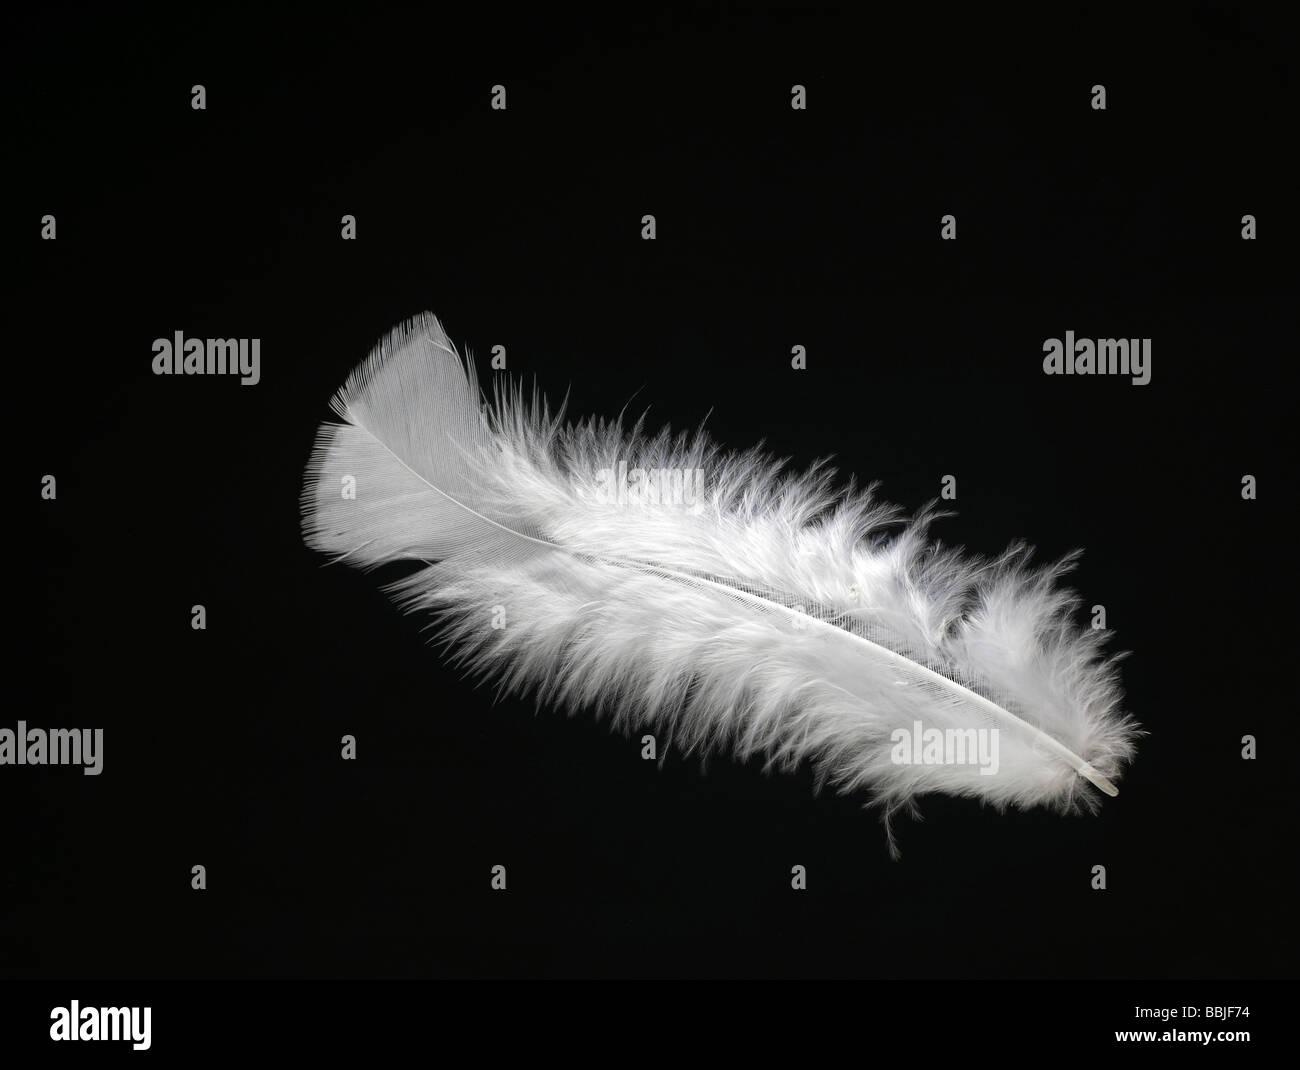 Feather Horizontal - Stock Image